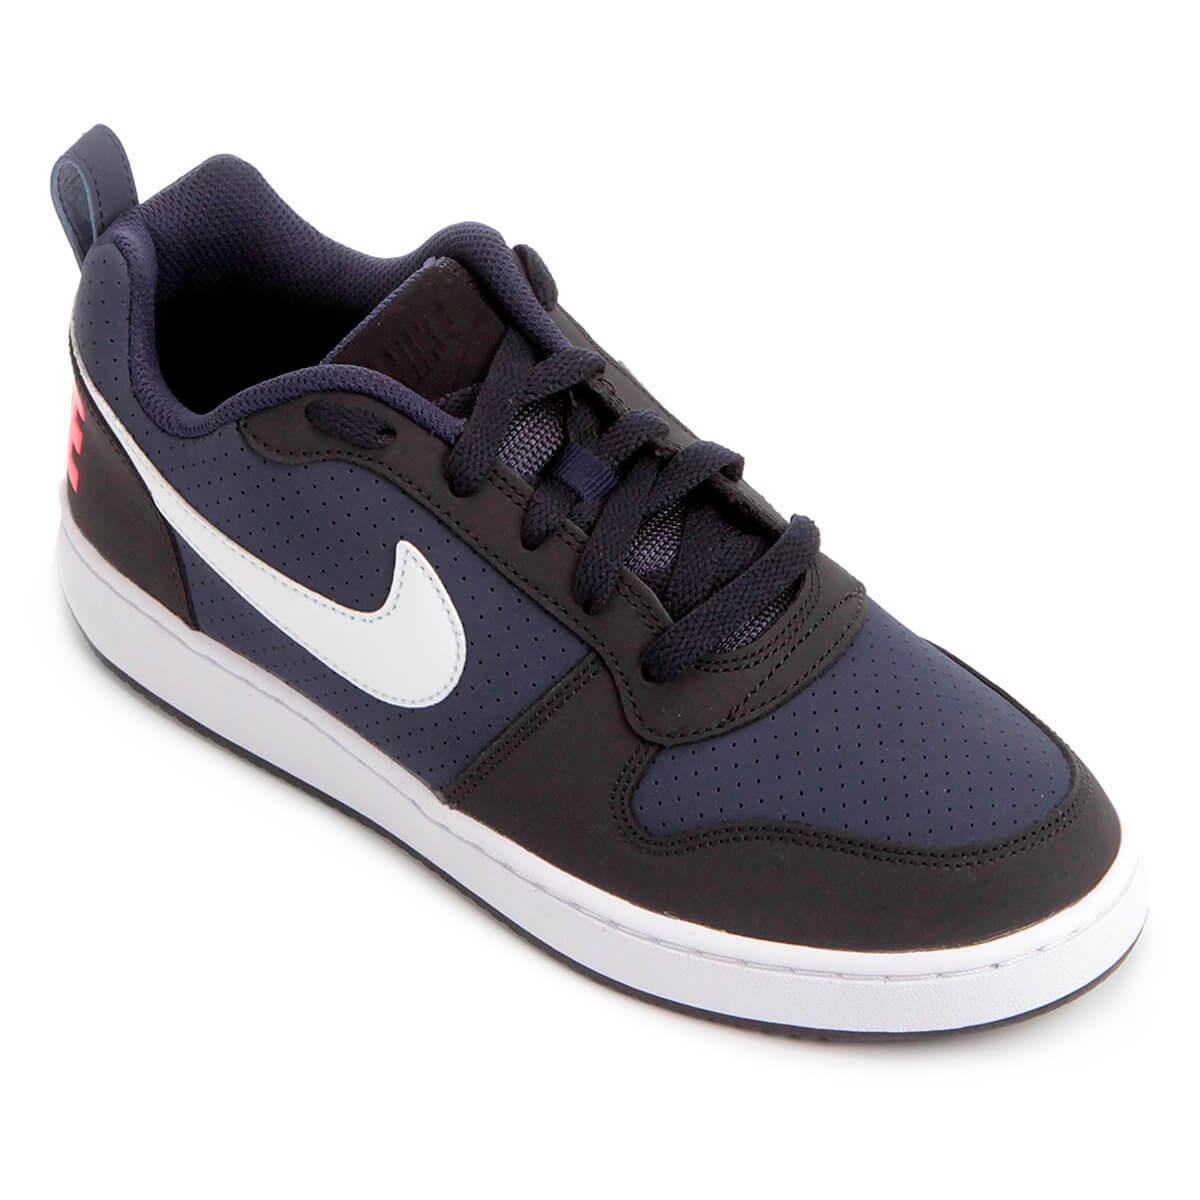 a98f61bfcfe Tênis Nike Court Borough Low Casual Masculino - Decker Online!